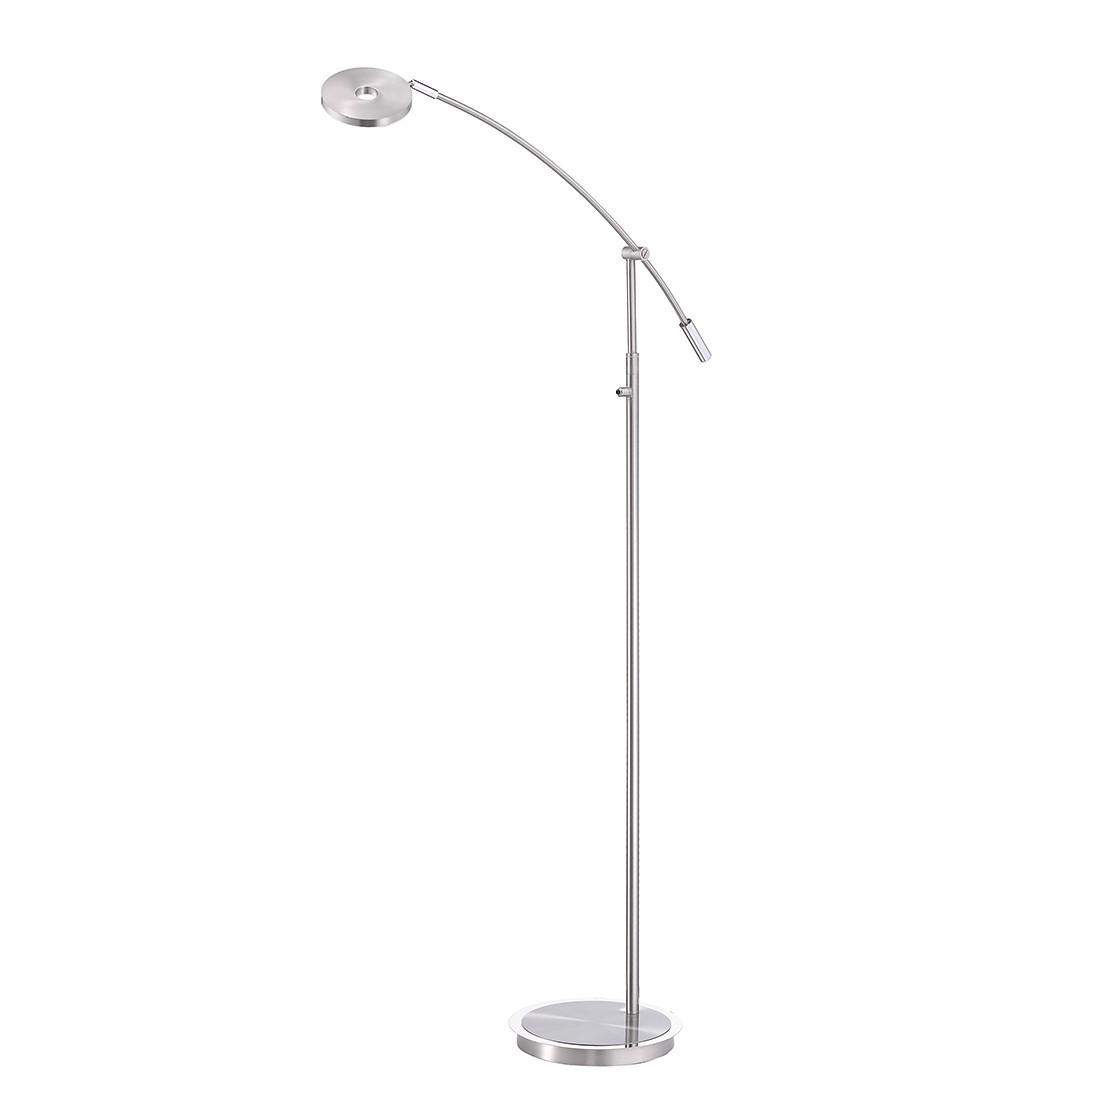 LED-Standleuchte Darß ● Nickel Matt ● Silber- FLI Leuchten A+